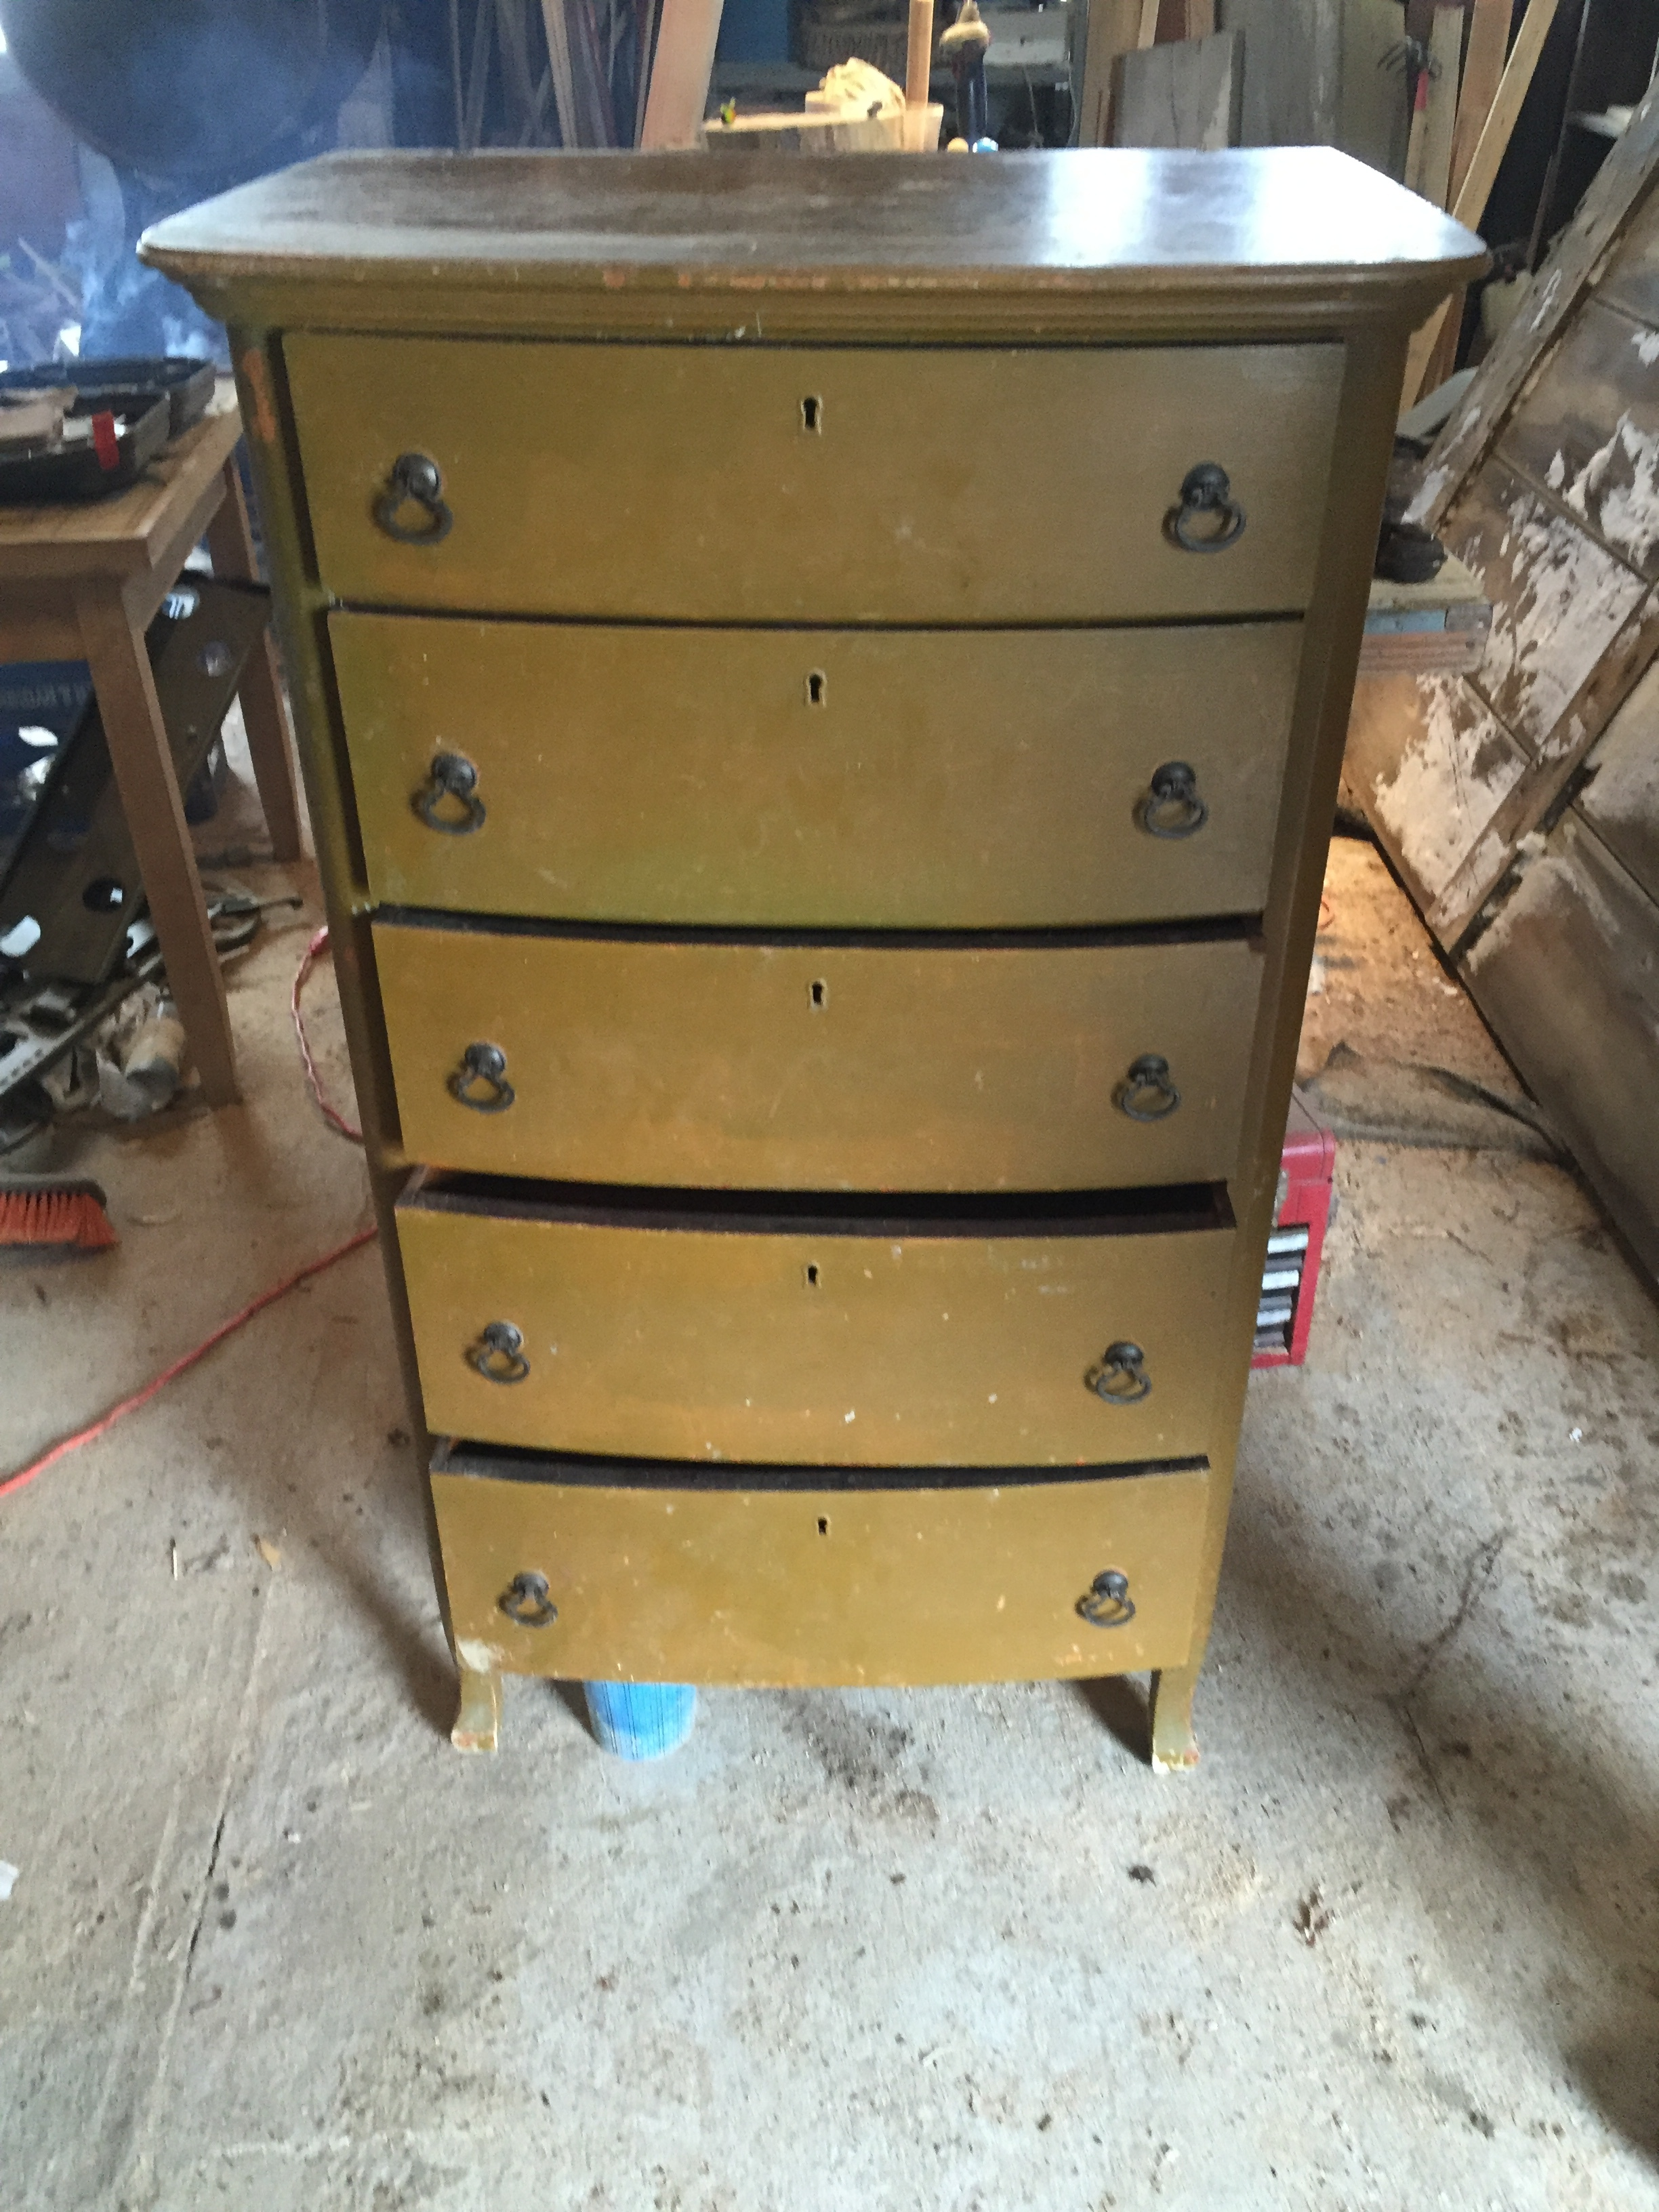 Ugly green antique dresser - Before